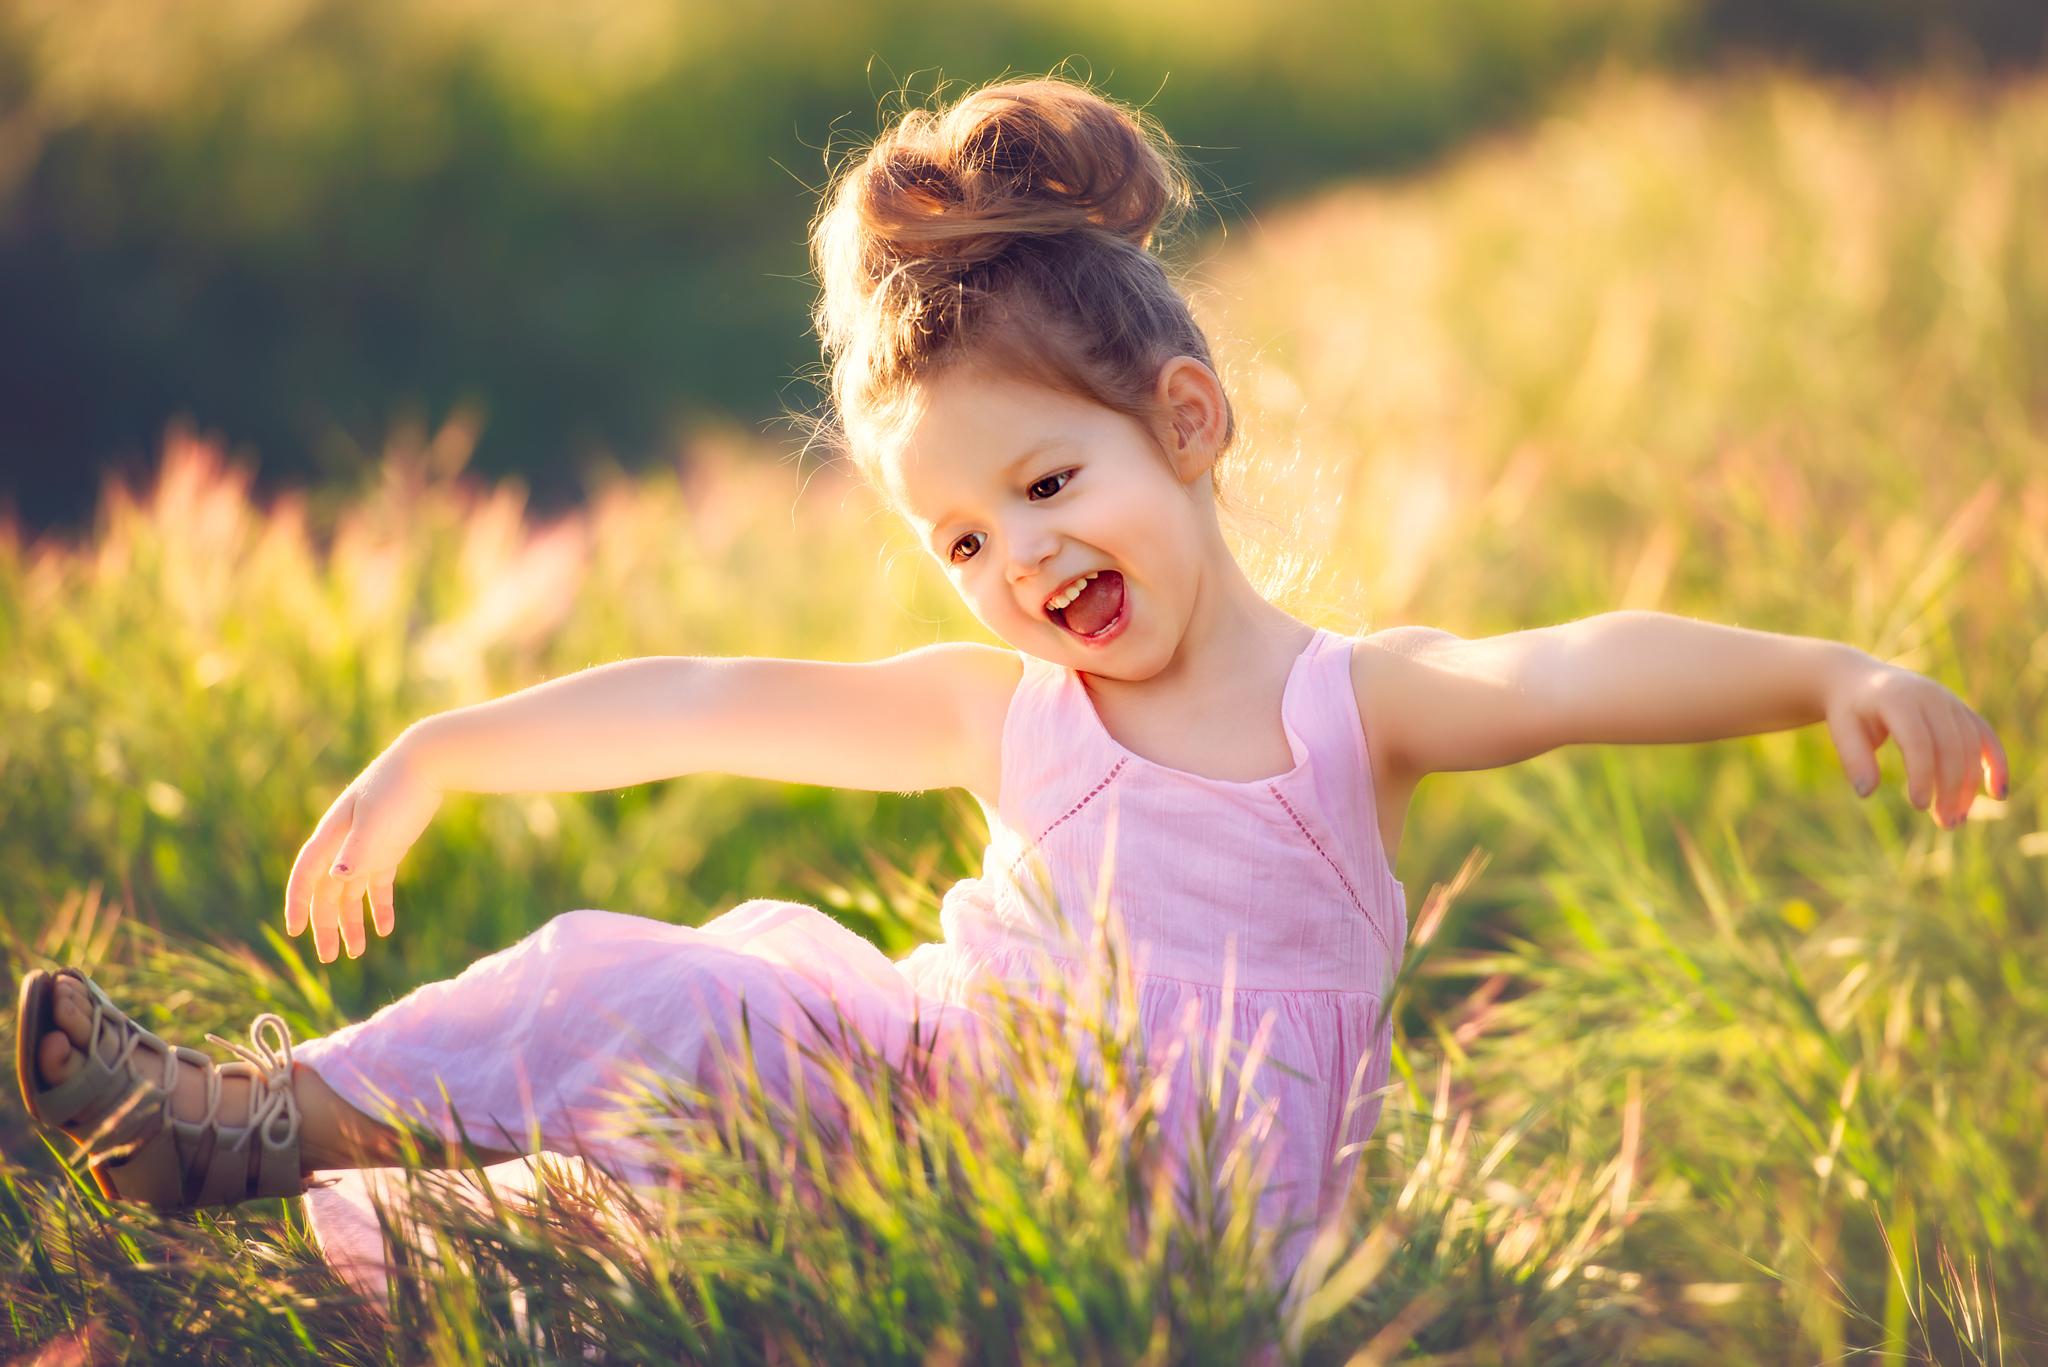 ребенок девочка  № 3563329 бесплатно